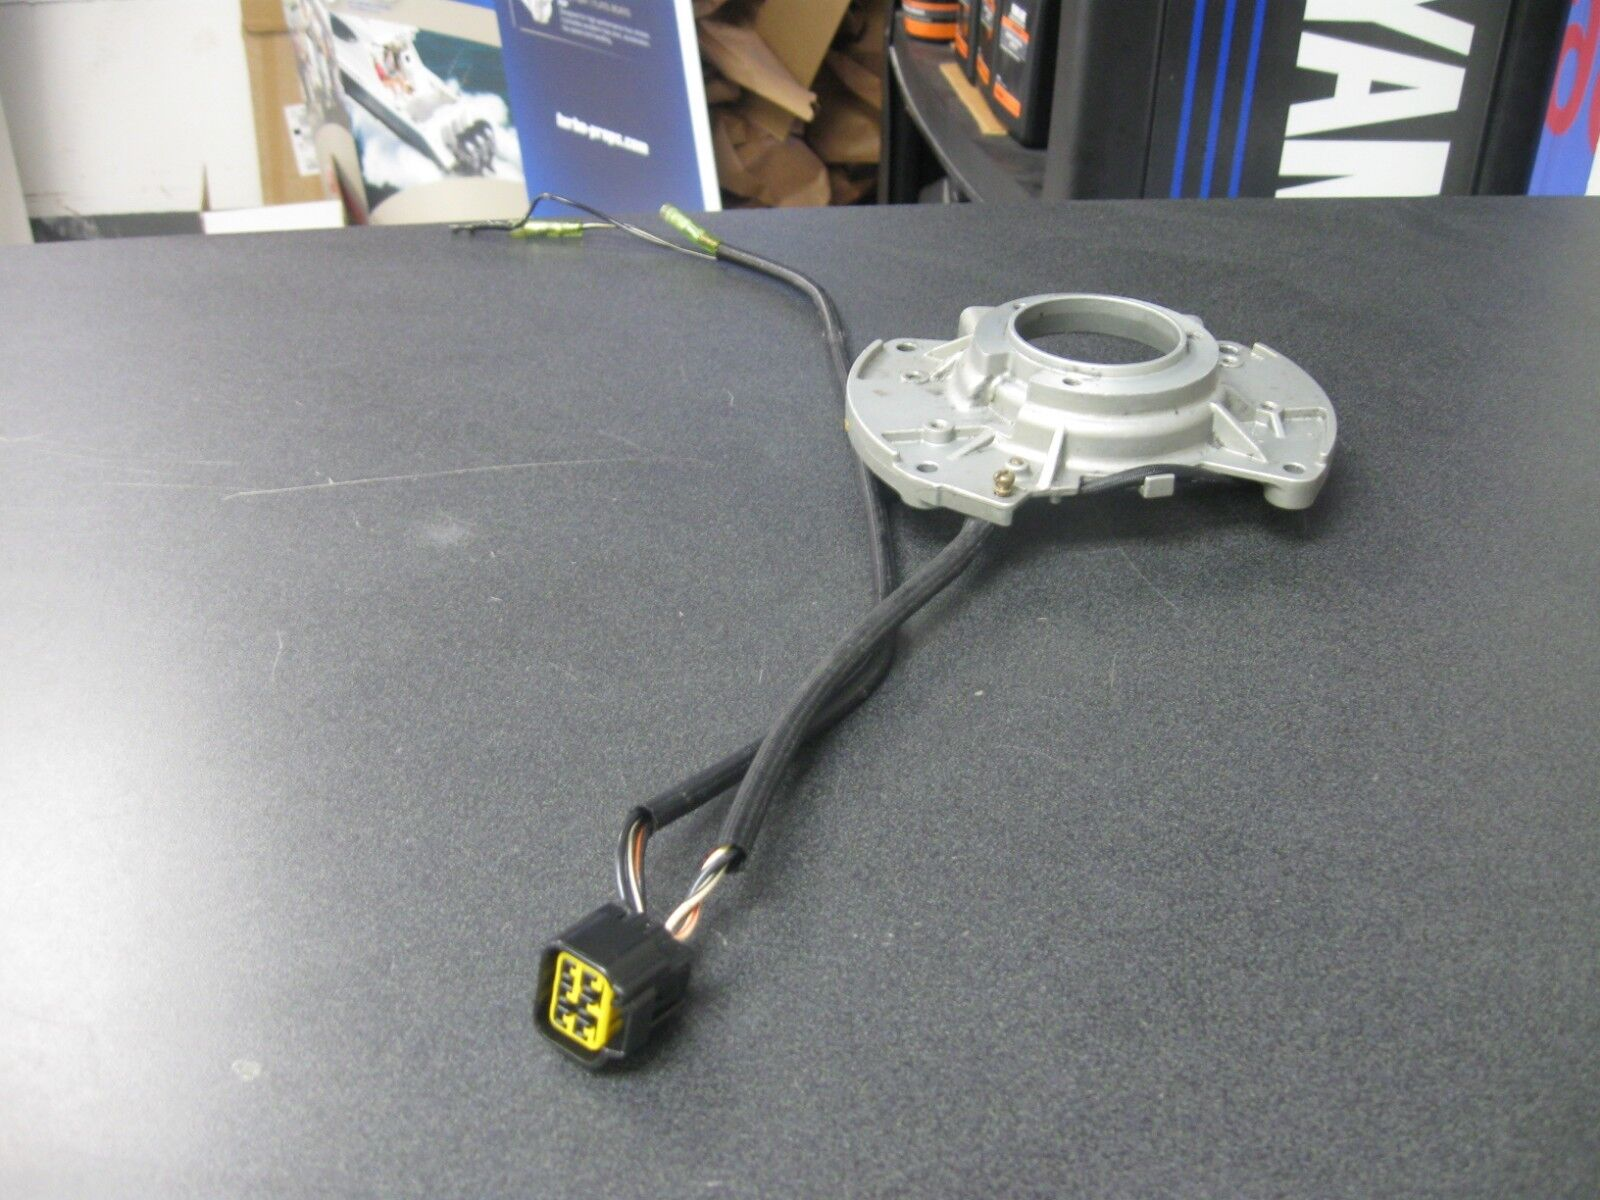 Yamaha Spule Außenborder Spule Yamaha Impulsgenerator 67F-85580-00-00 a400cb